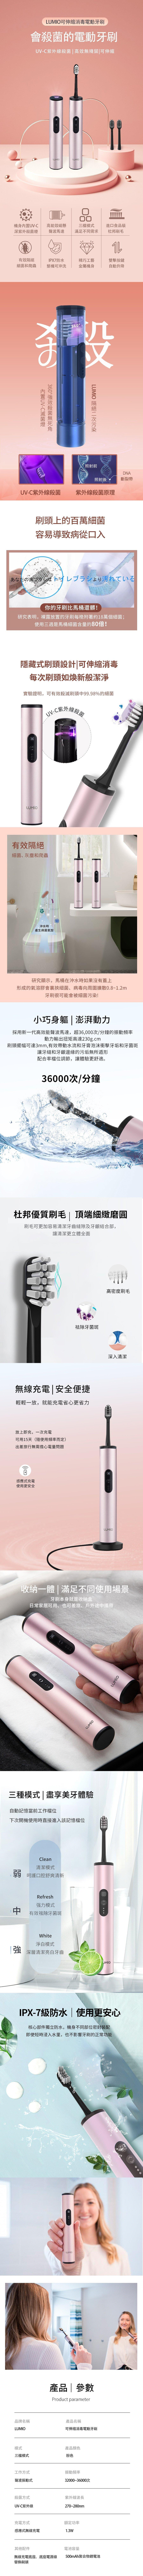 LUMIO 可伸縮消毒電動牙刷